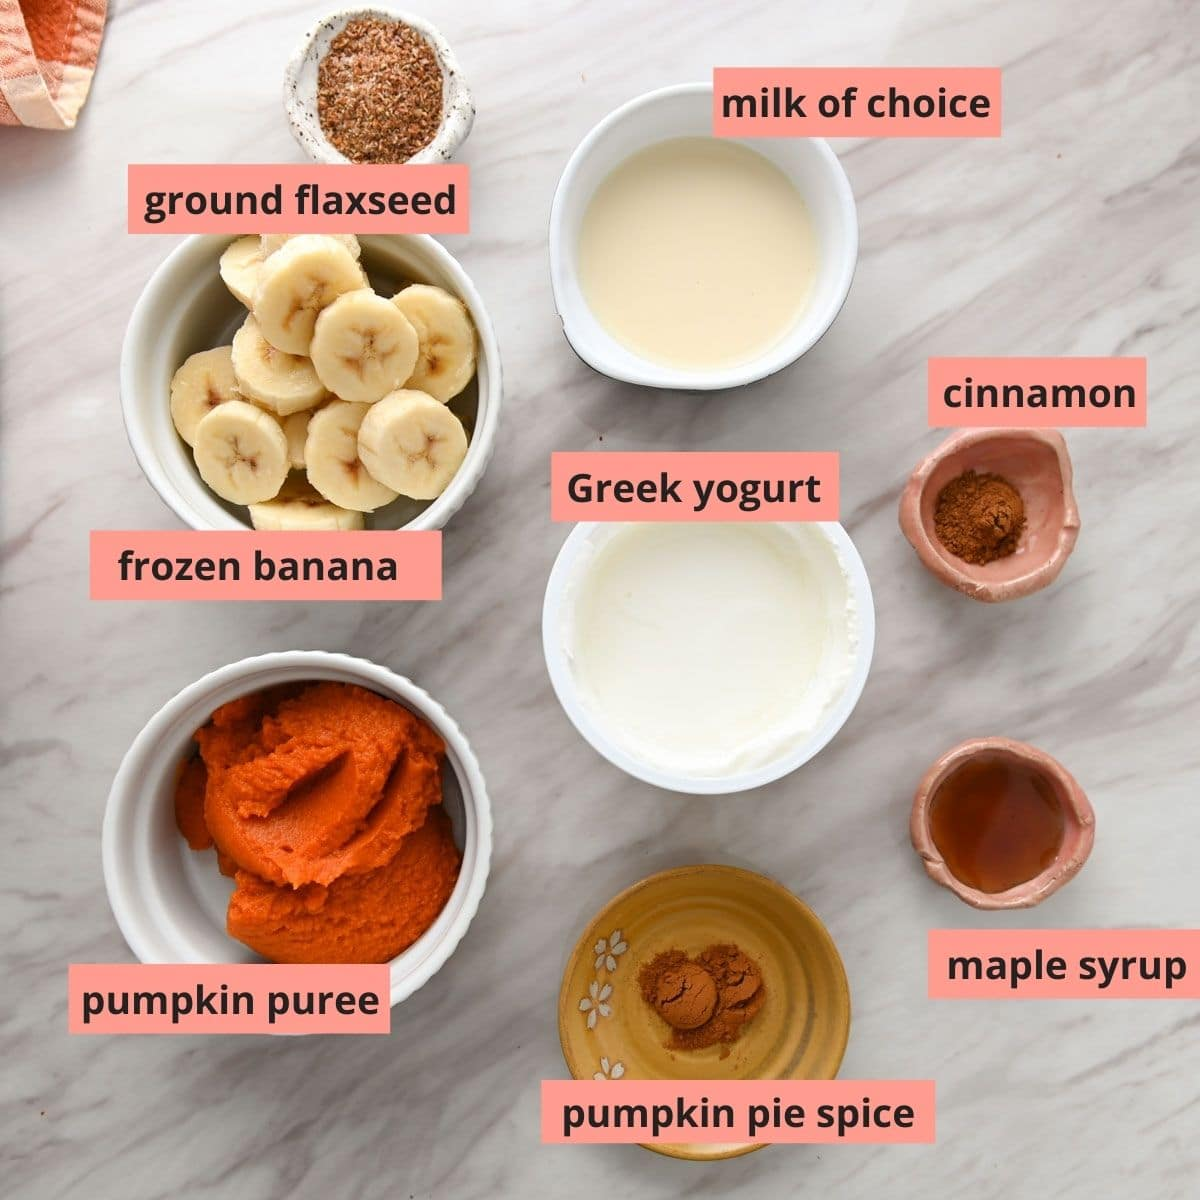 Labeled ingredients used to make pumpkin smoothie